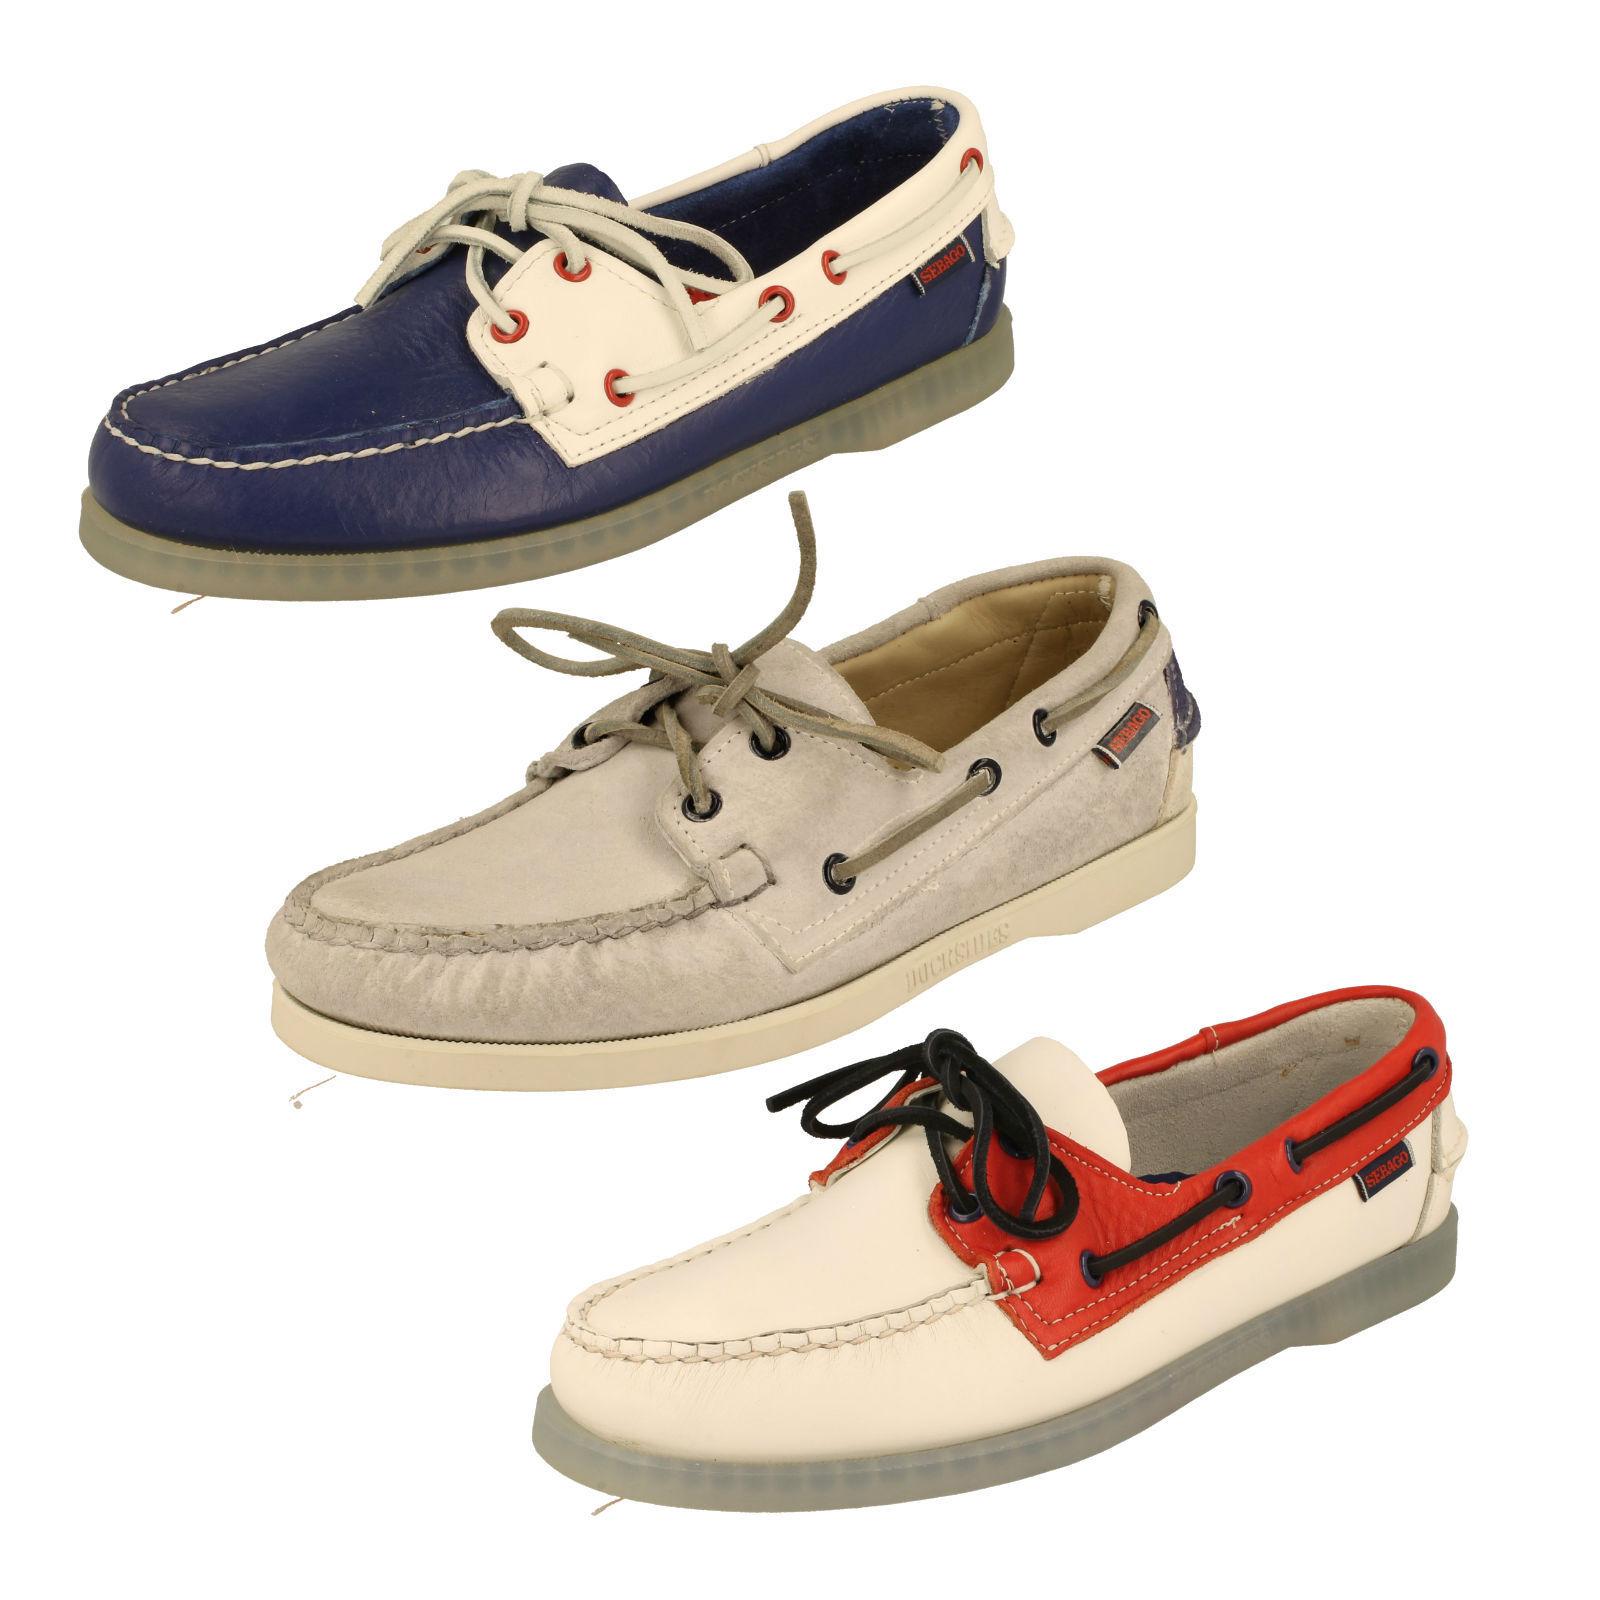 Da Uomo Sebago Barca / Shoes-SPINNAKER Deck Shoes-SPINNAKER / 5566e2